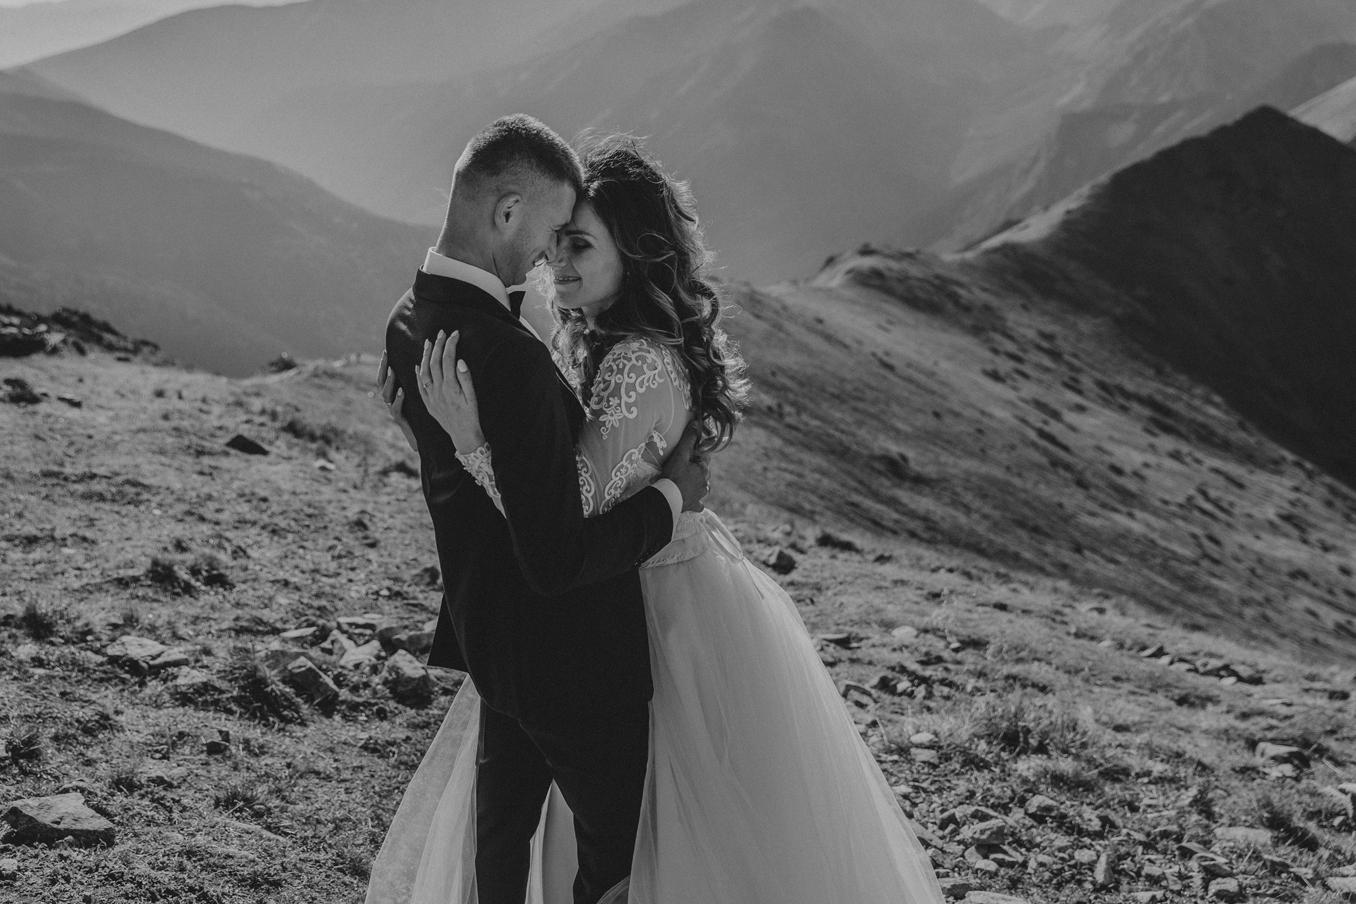 mountains_Klaudia&Dawid_weddingphotographer008.jpg